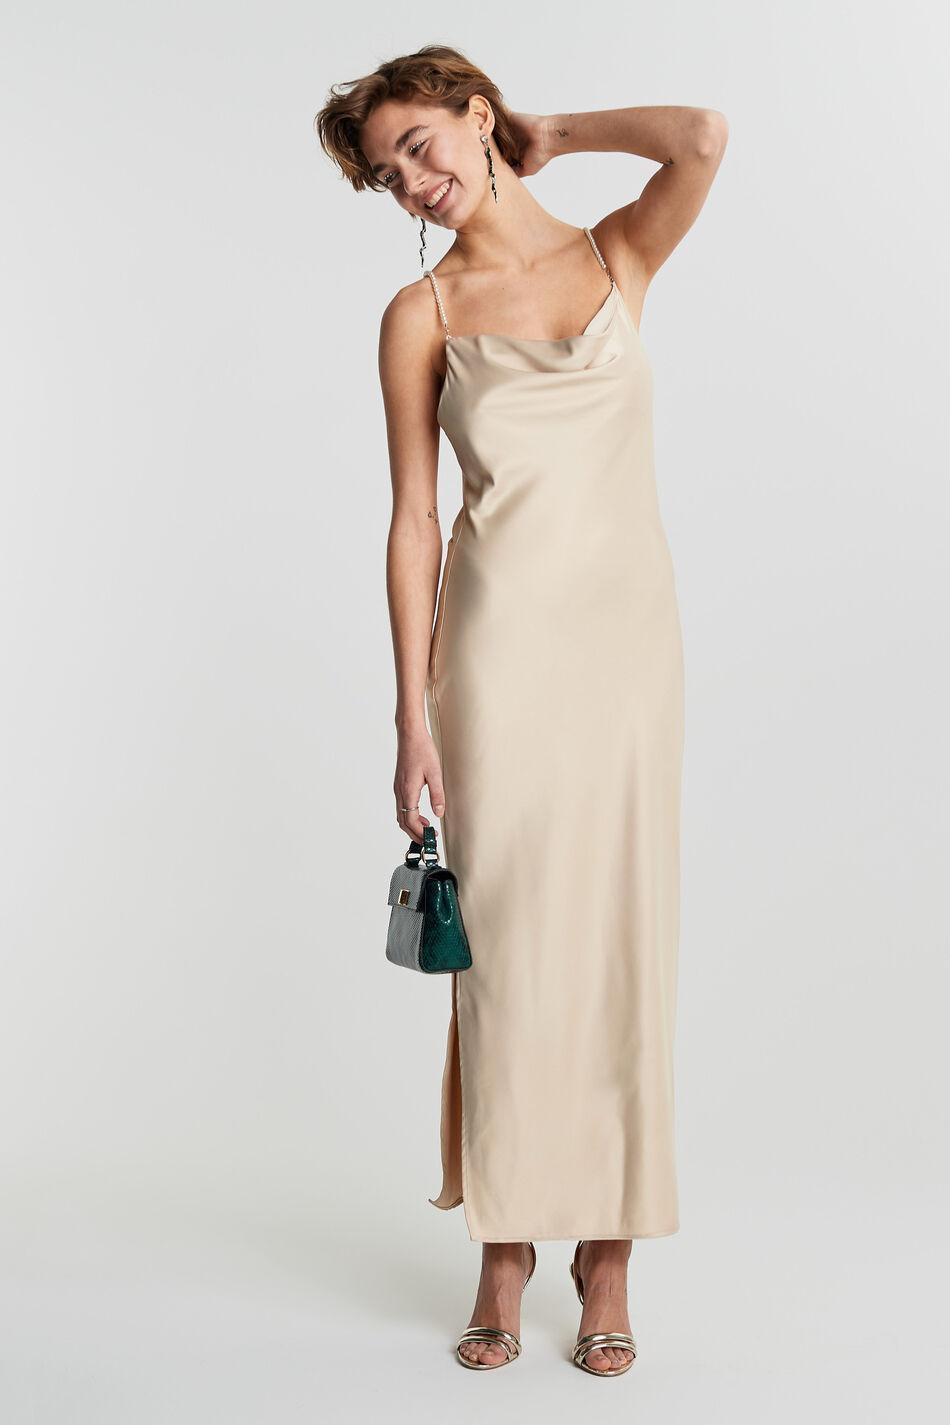 Gina Tricot Salina pearl dress